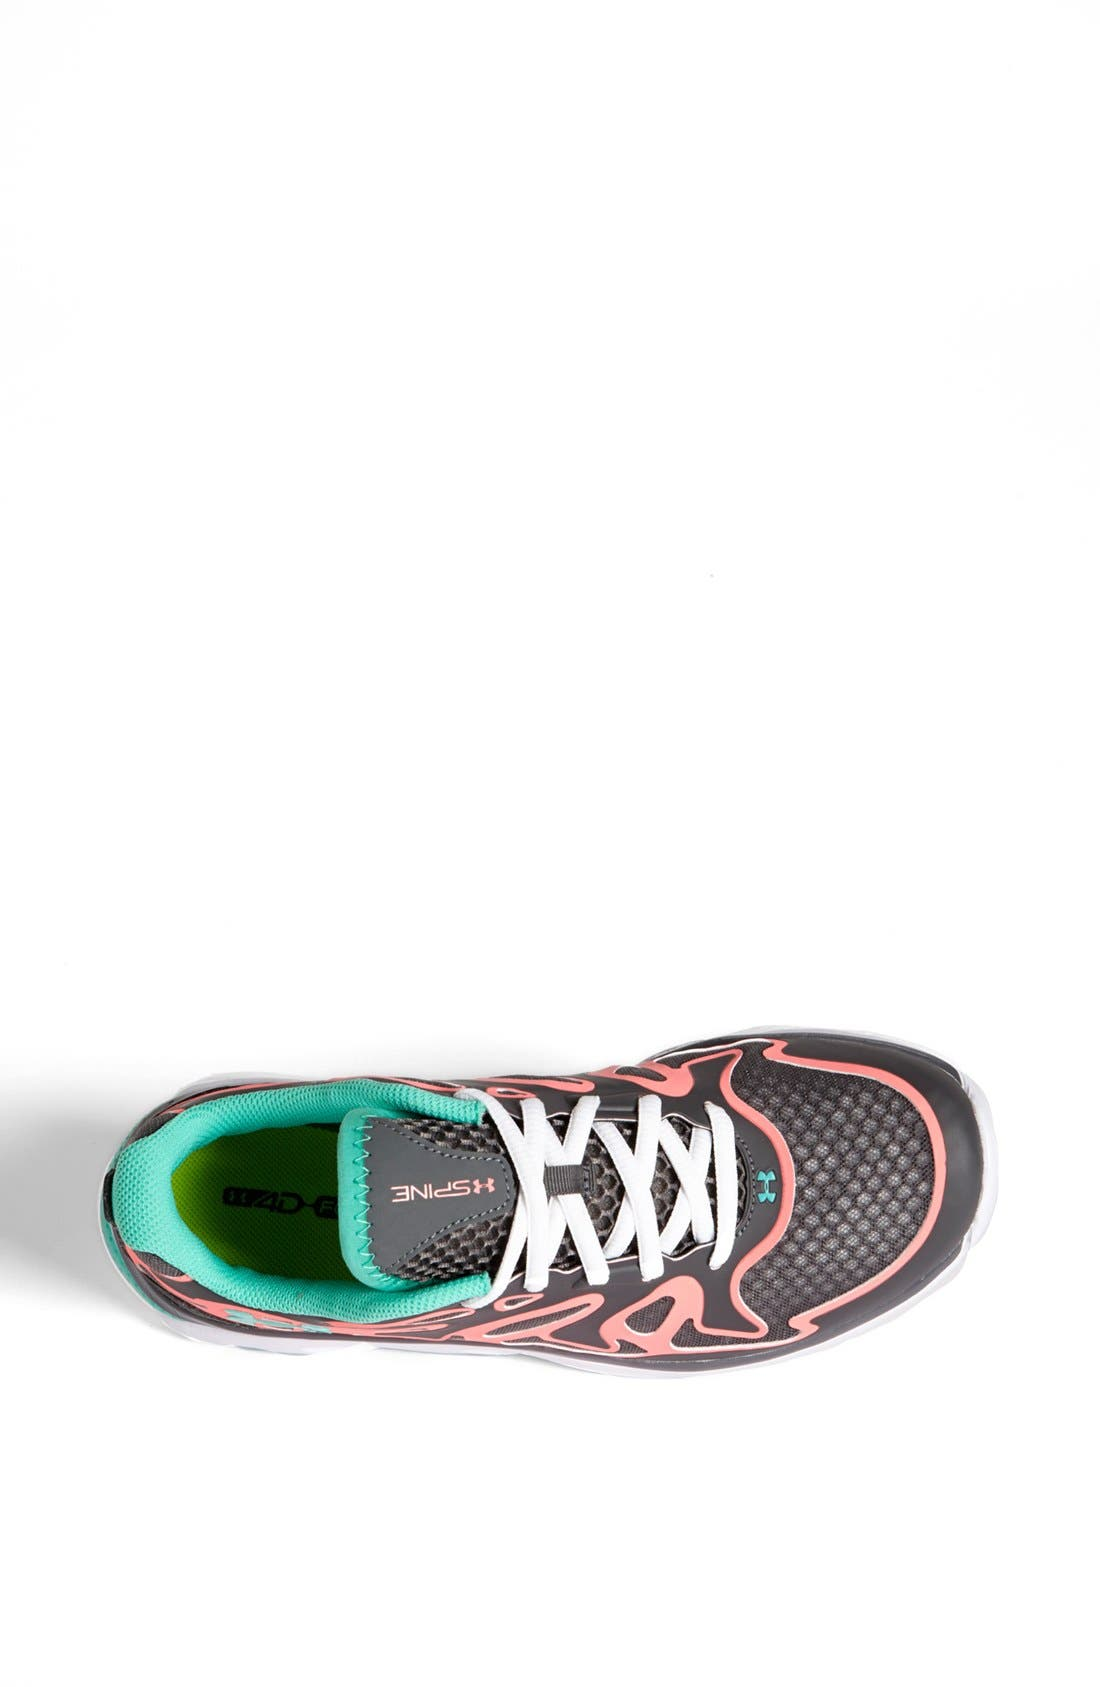 Alternate Image 3  - Under Armour 'Spine™ Evo' Running Shoe (Women)